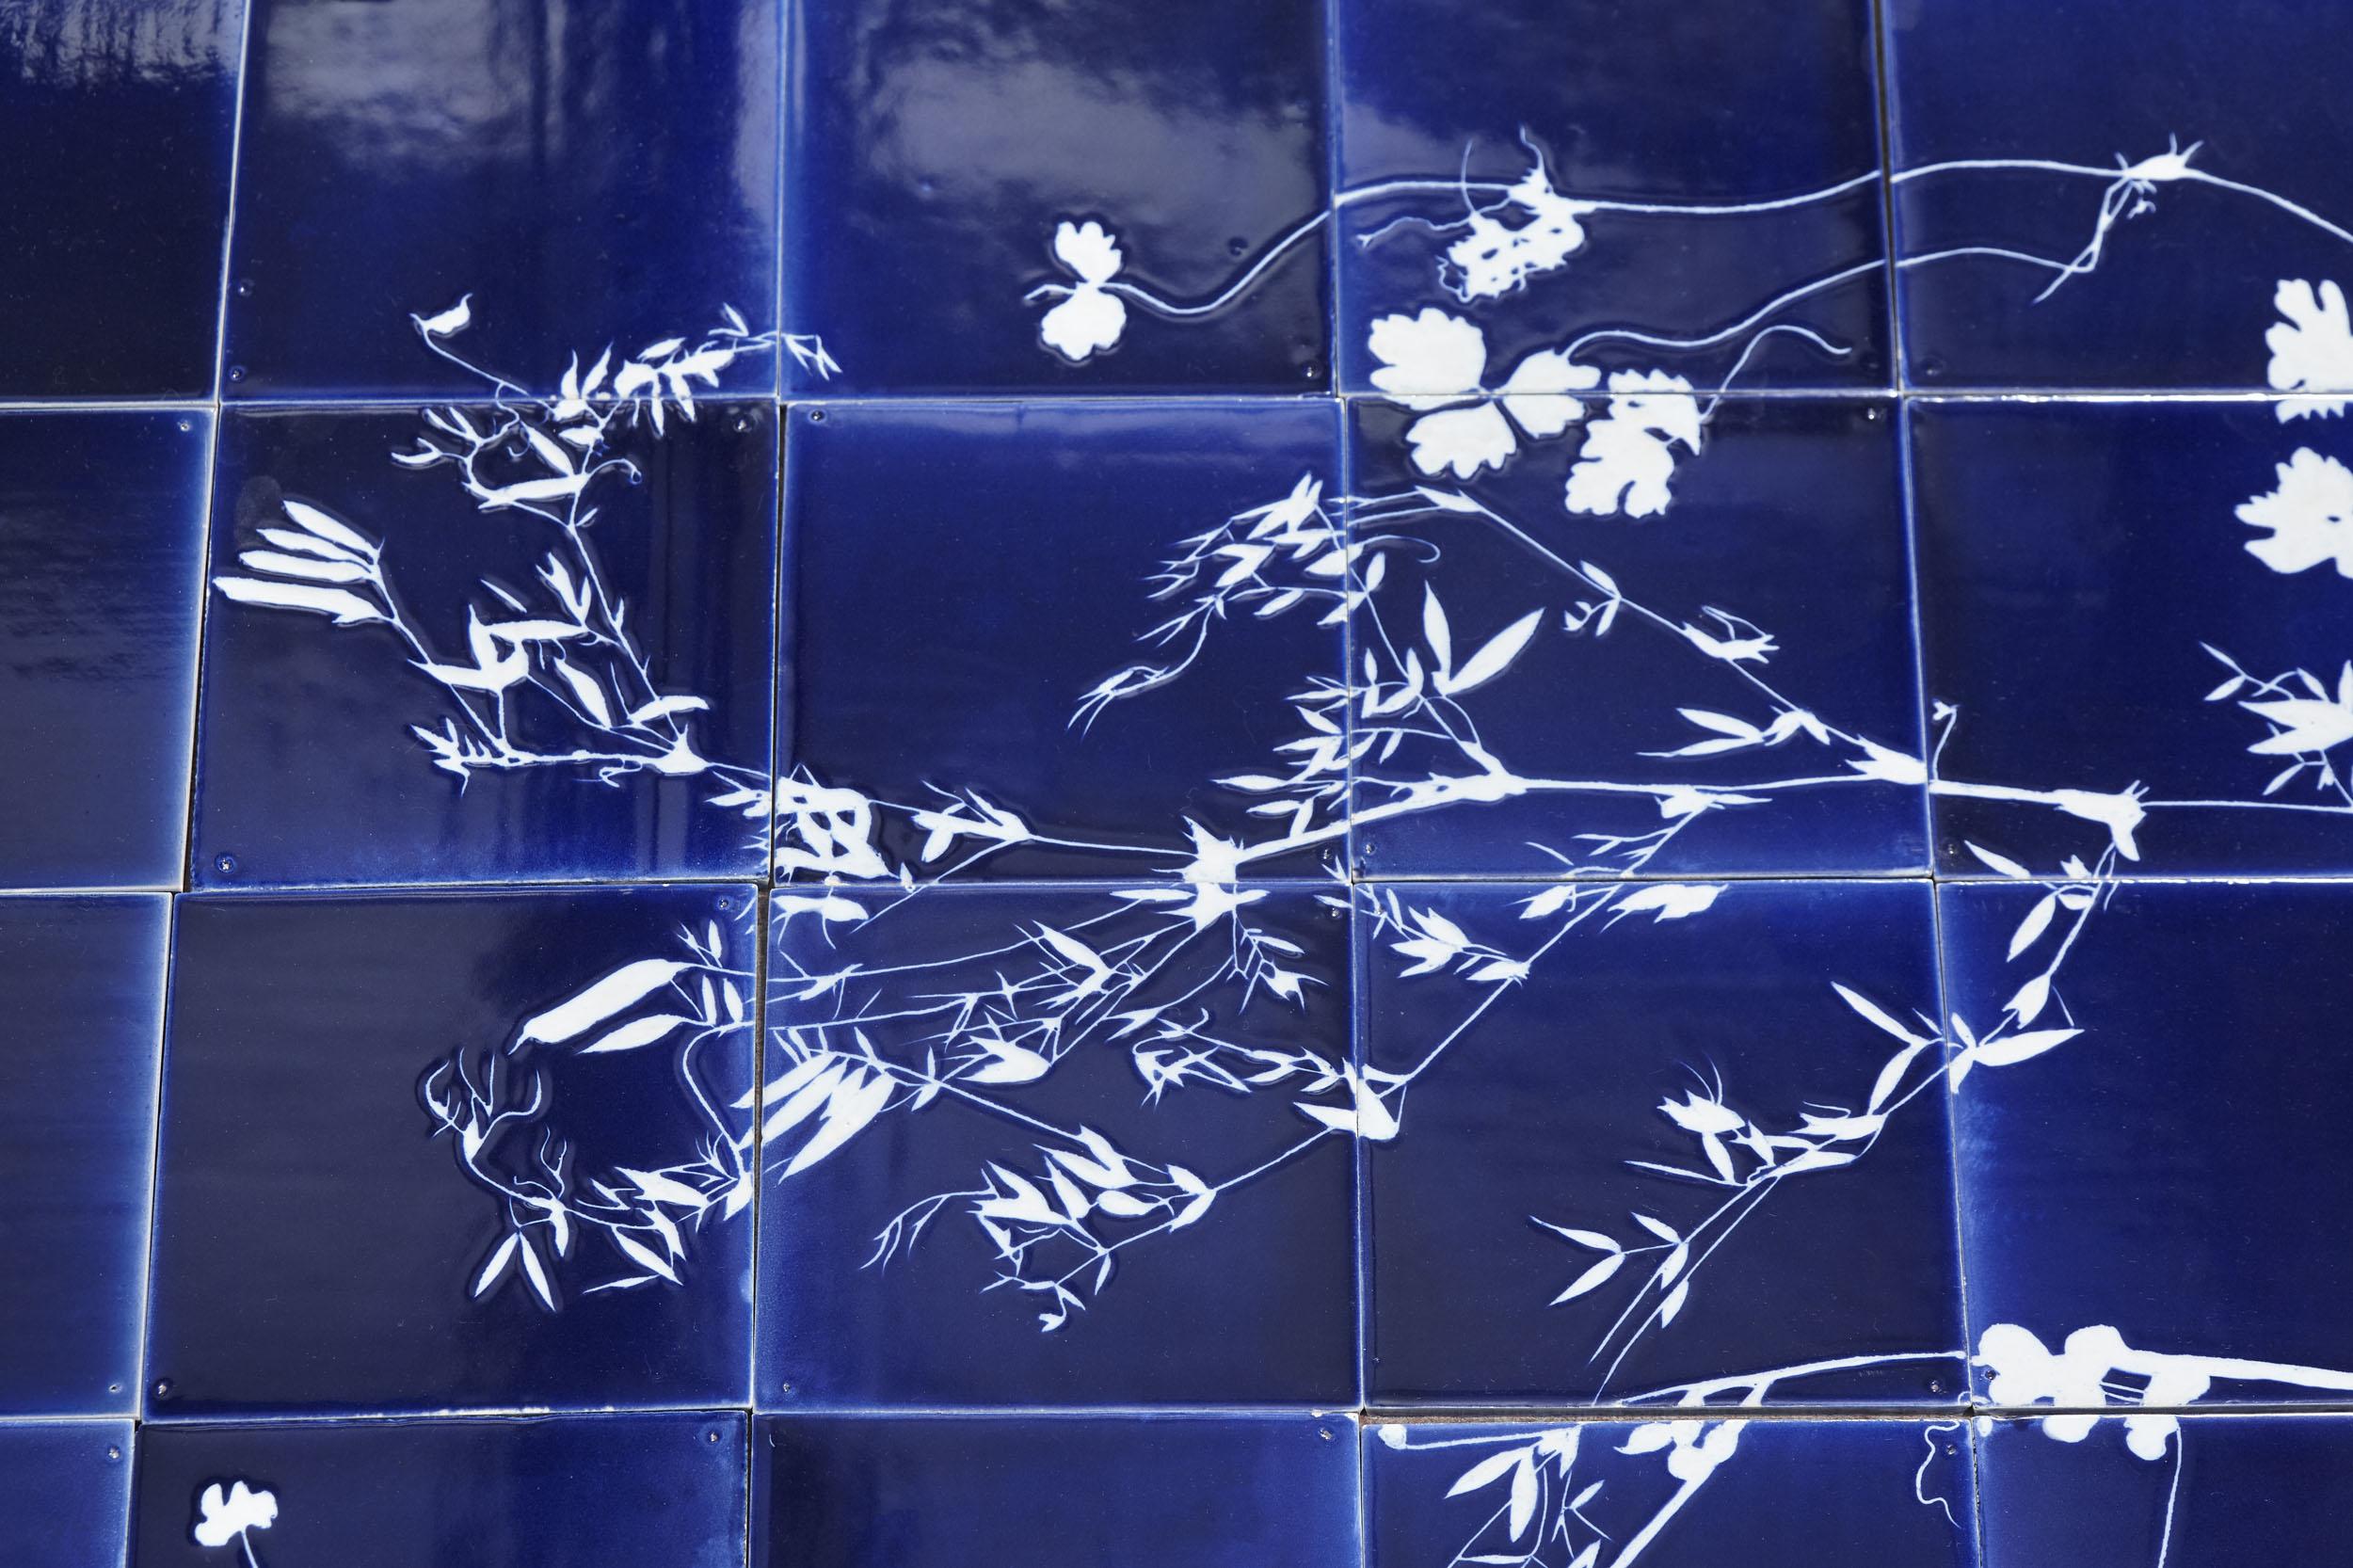 Blue Botanical Tiles with design of foraged weeds